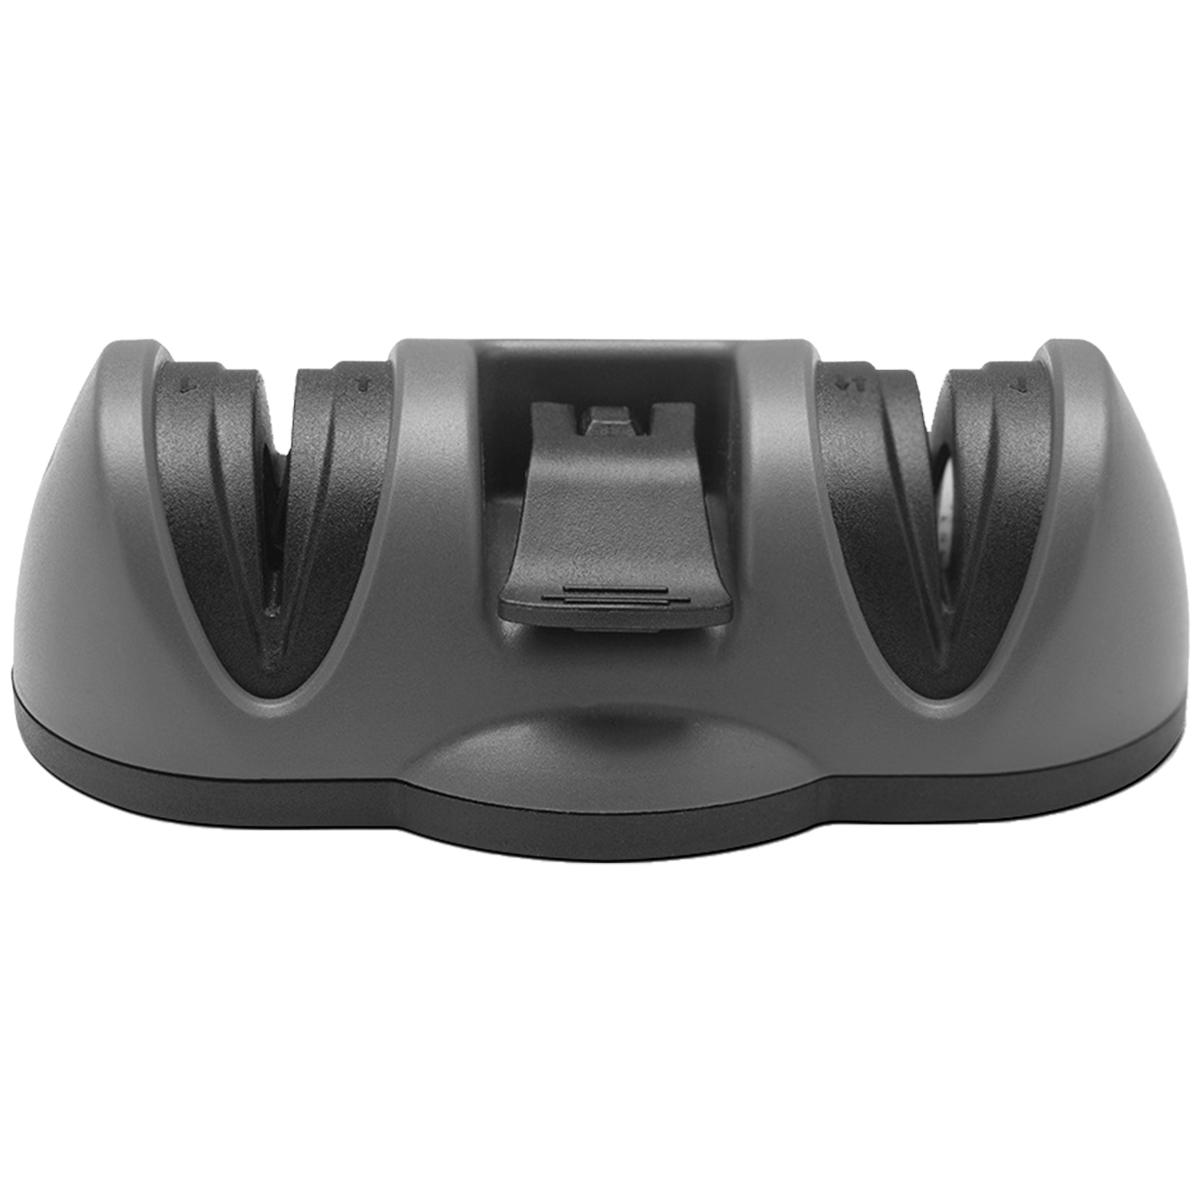 Afiador De Facas Abs Aço Inox 13cm Suprema 13x7x4,5cm Brinox